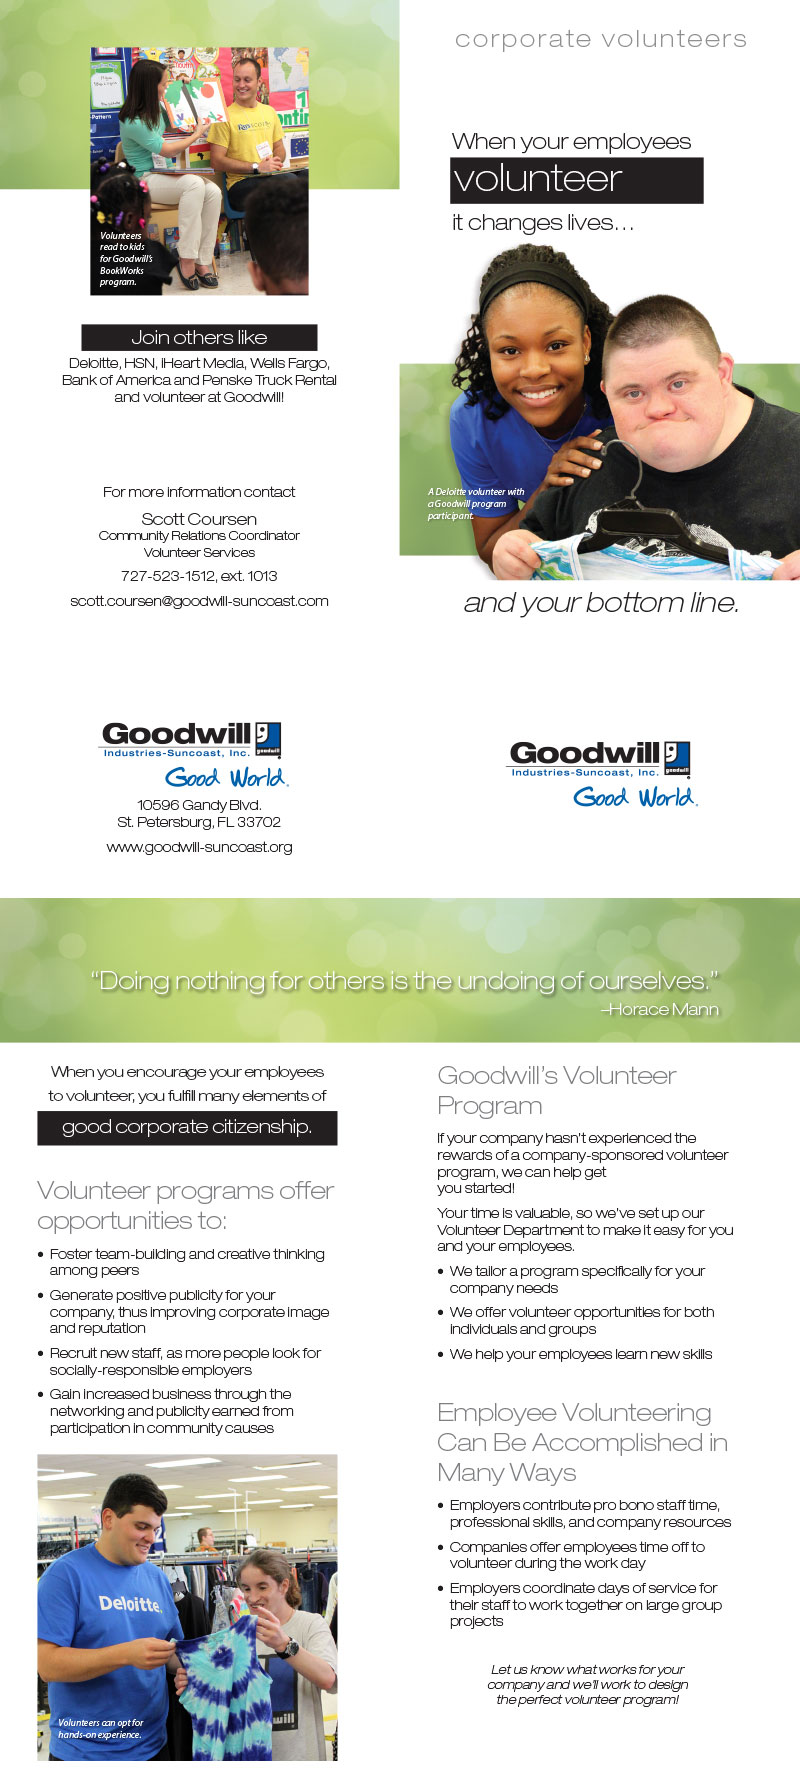 goodwill brochures goodwill industries suncoast